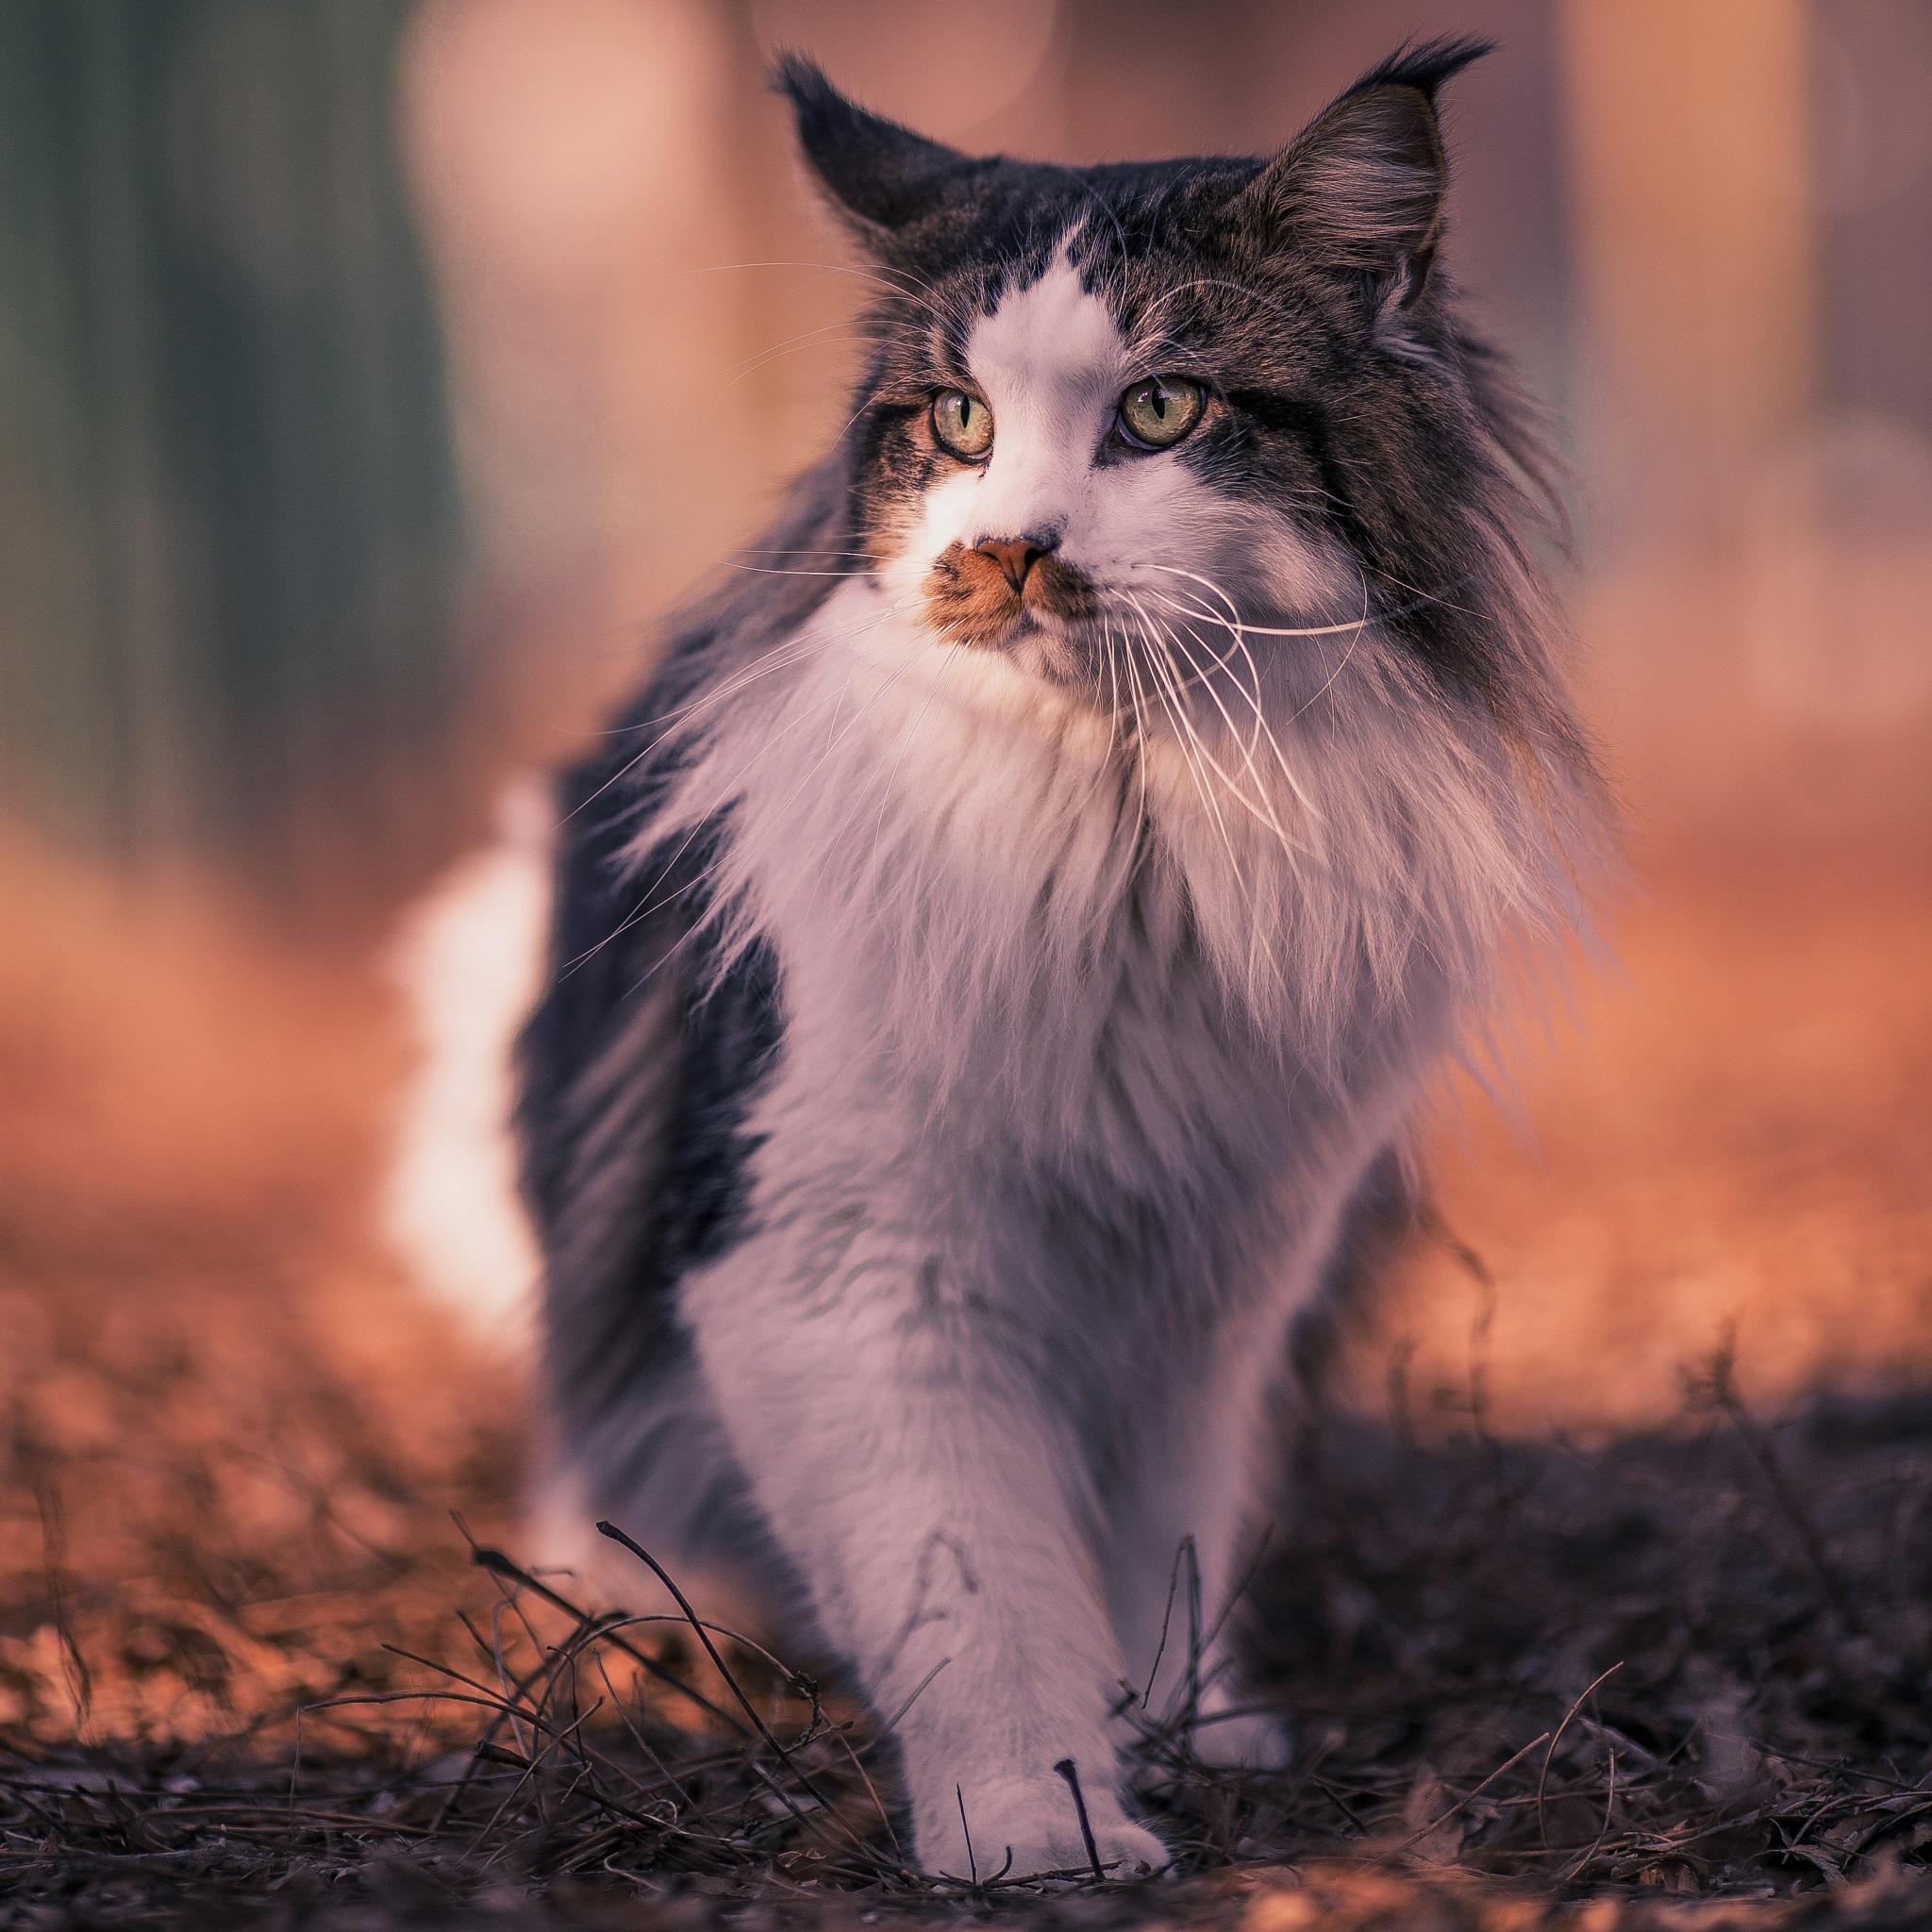 Feline Bokeh  by Moreno Pregno Photography